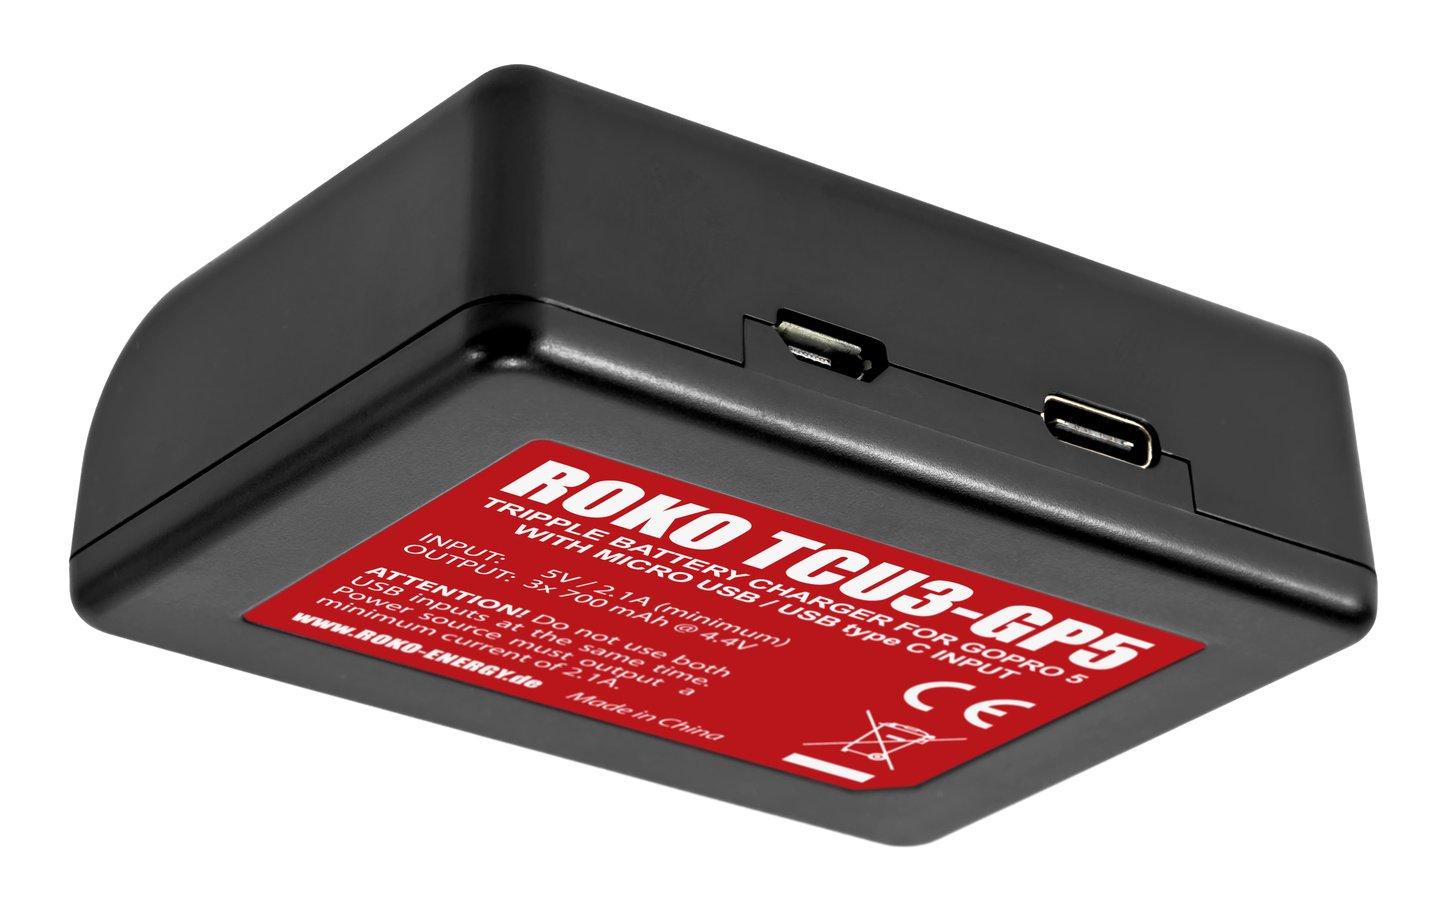 ROKO TCU3-GP5 Dreifach-Ladegerät mit USB für GoPro AABAT-001 Akku (Hero 5 6 7) Foto Nr. 2